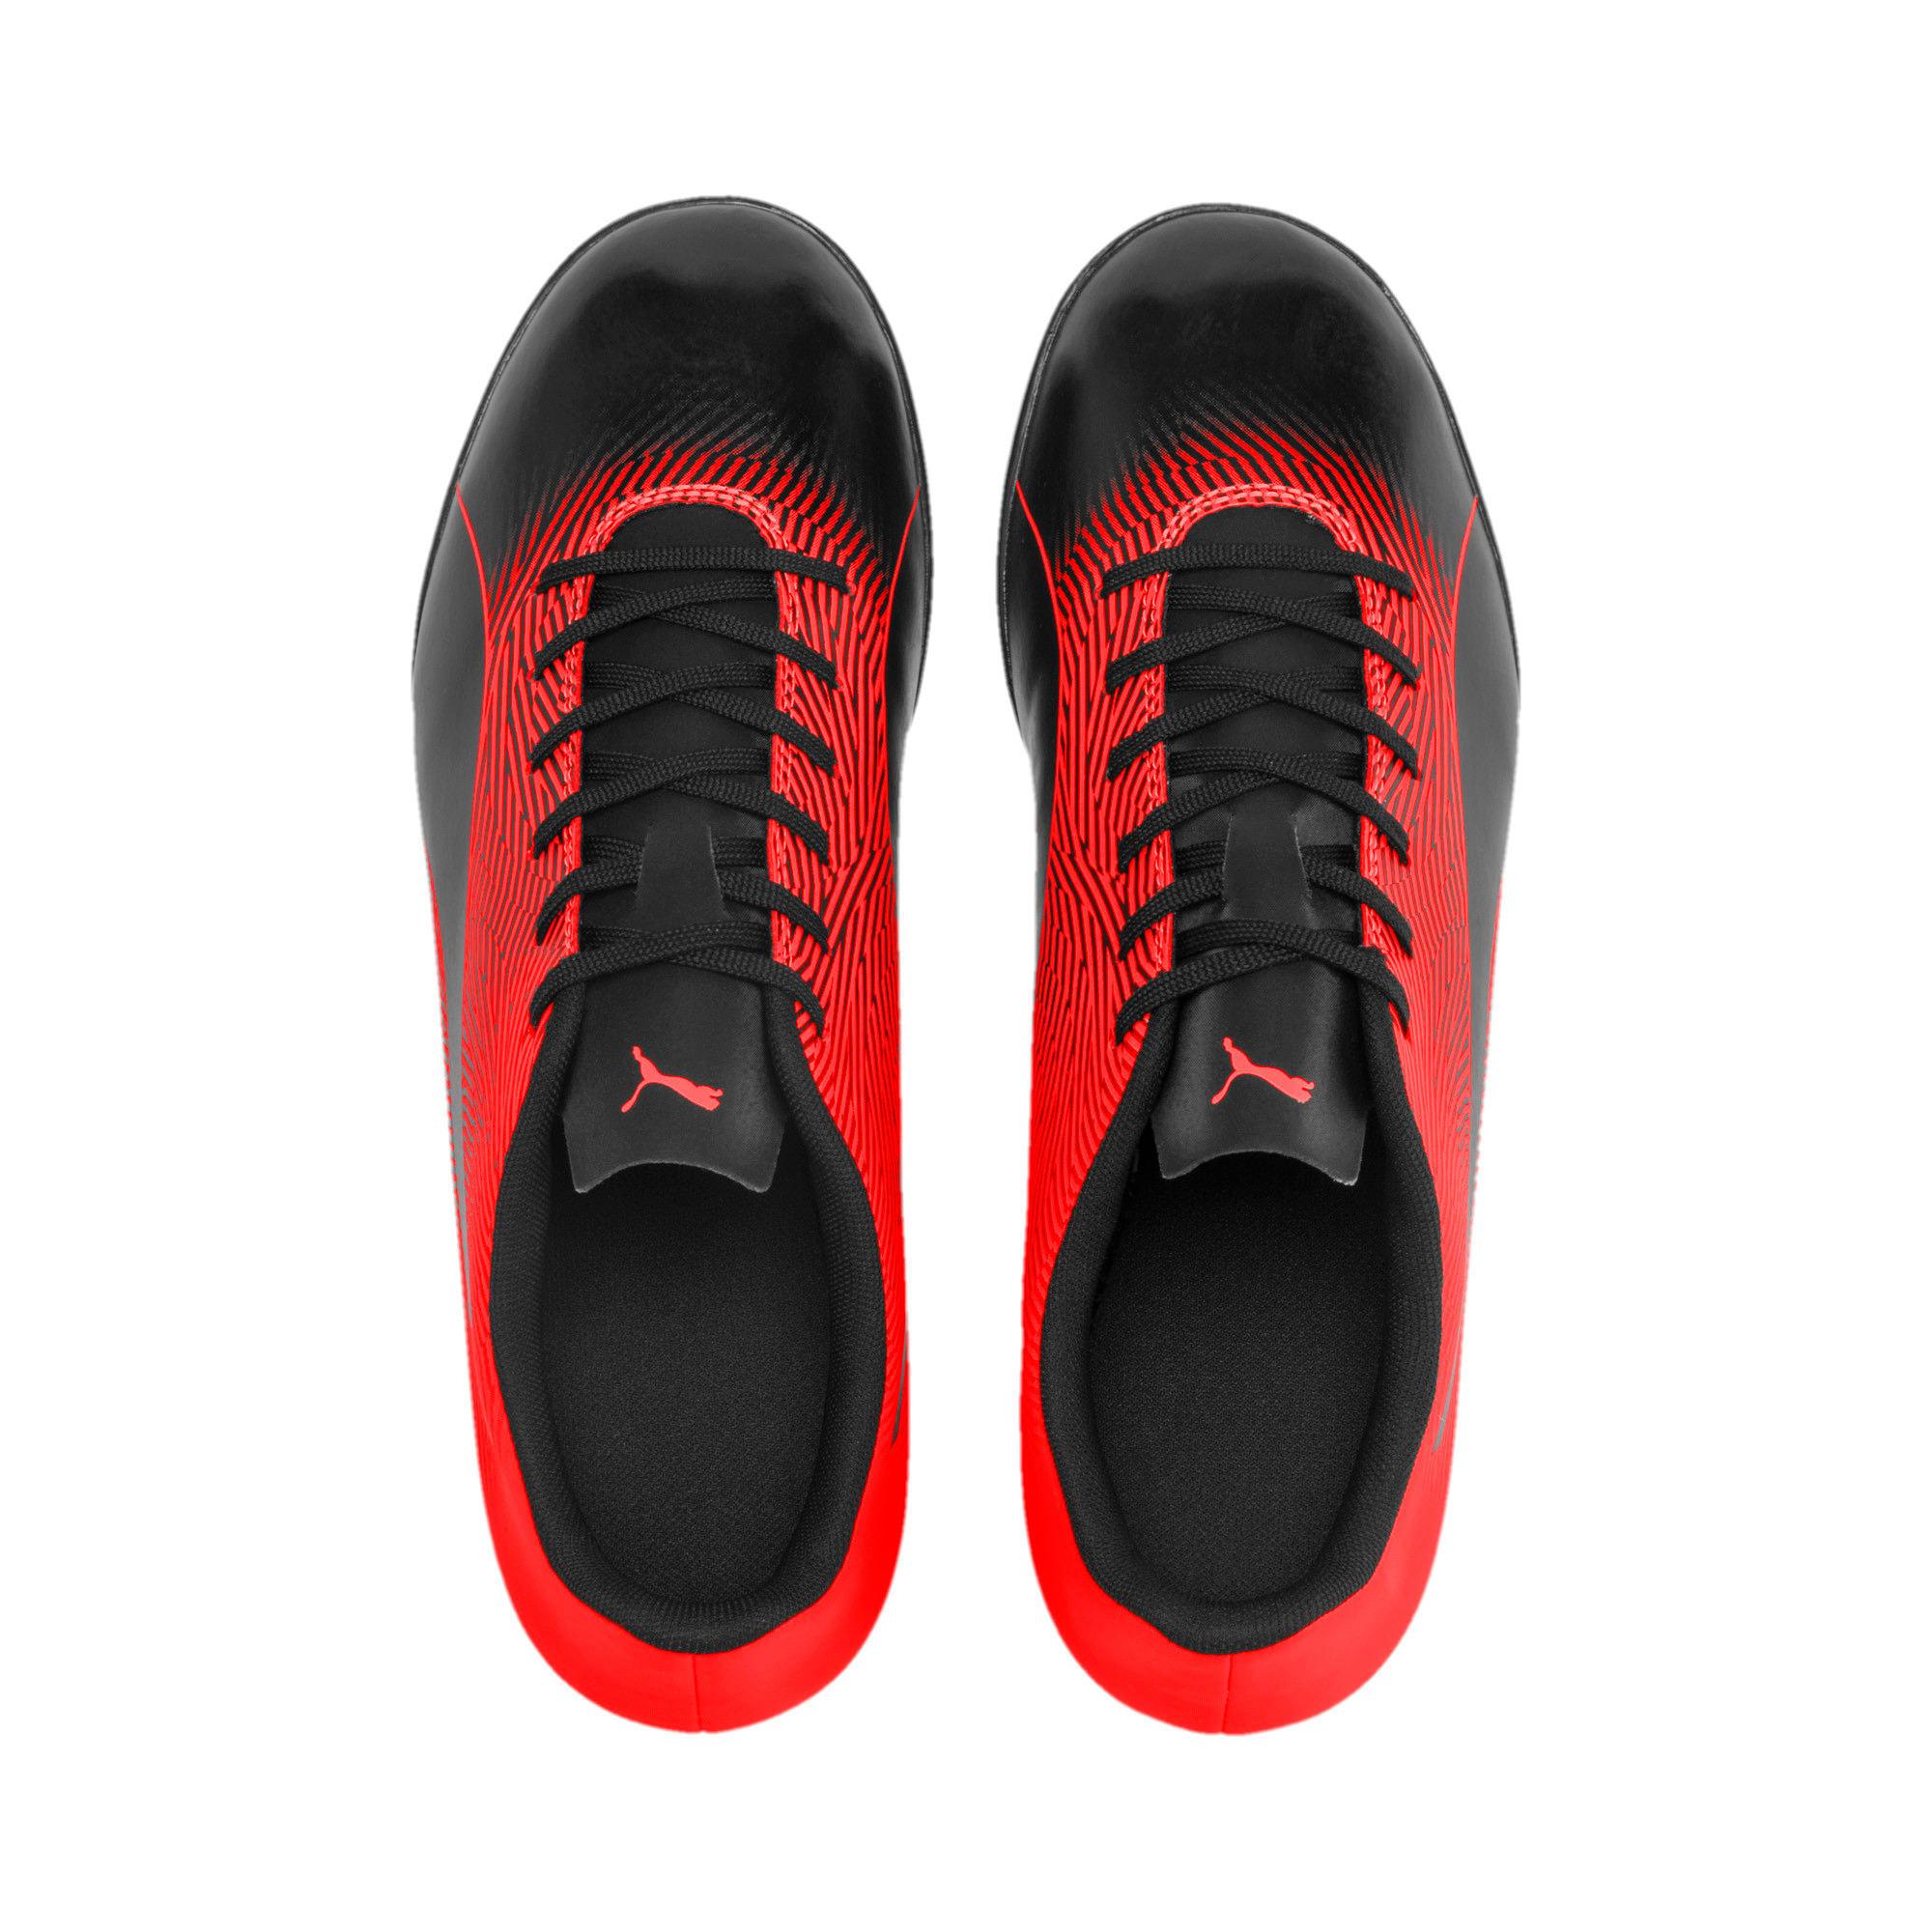 Thumbnail 7 of PUMA Spirit II TT Men's Soccer Shoes, Puma Black-Nrgy Red, medium